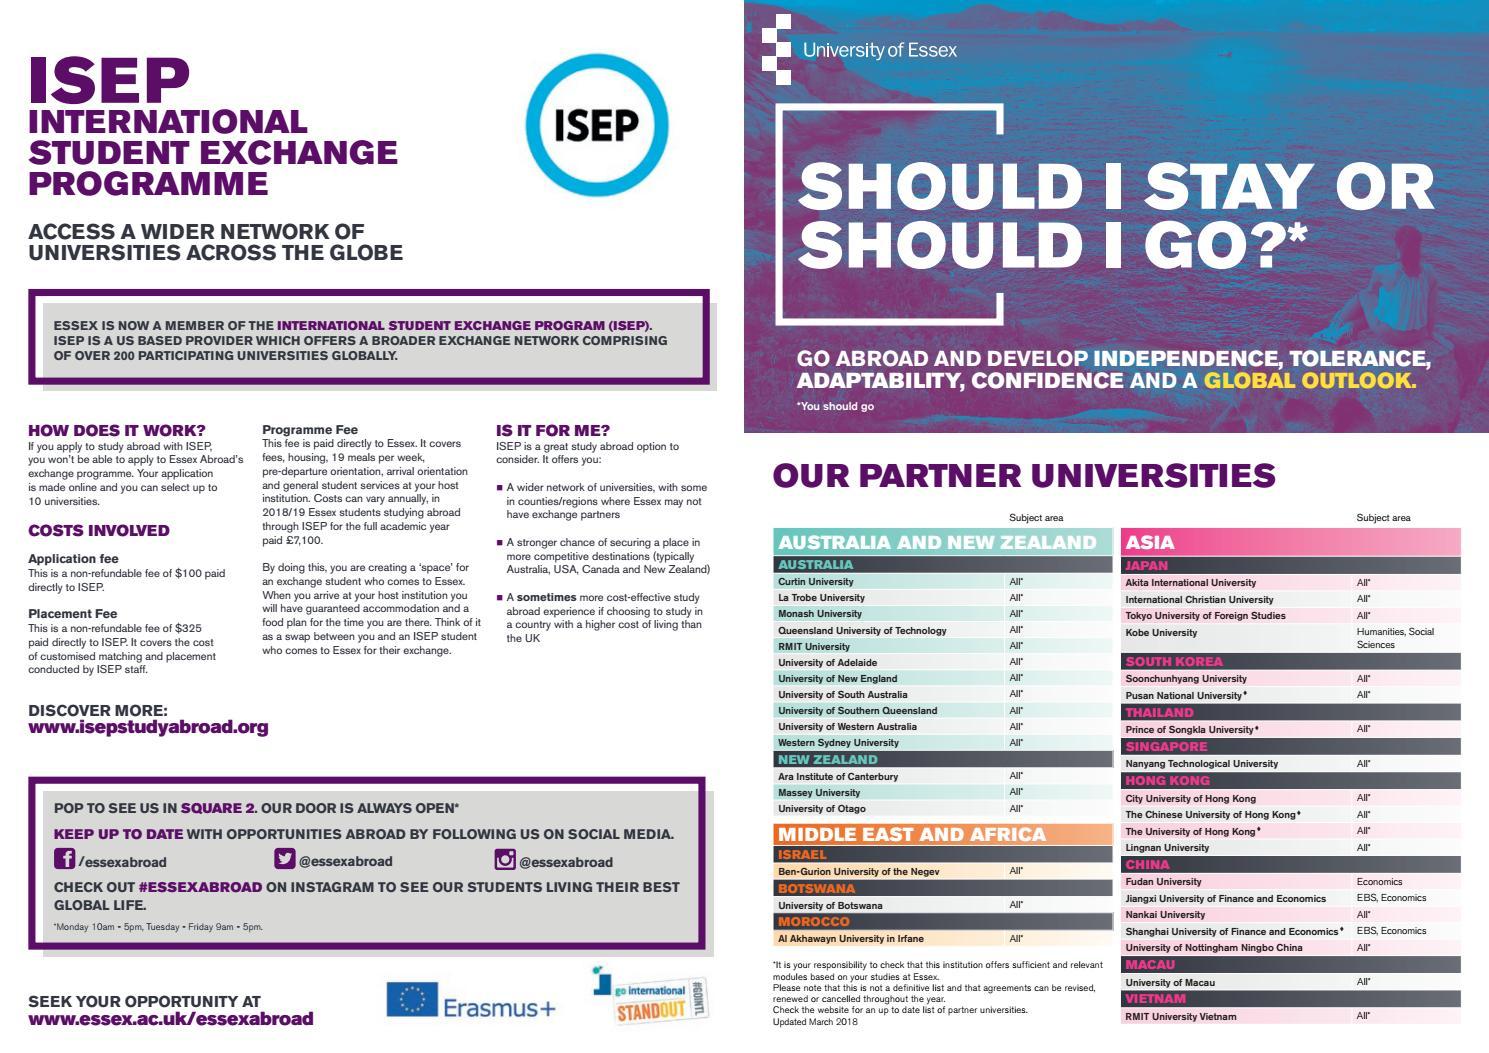 Partner universities of the University of Essex by